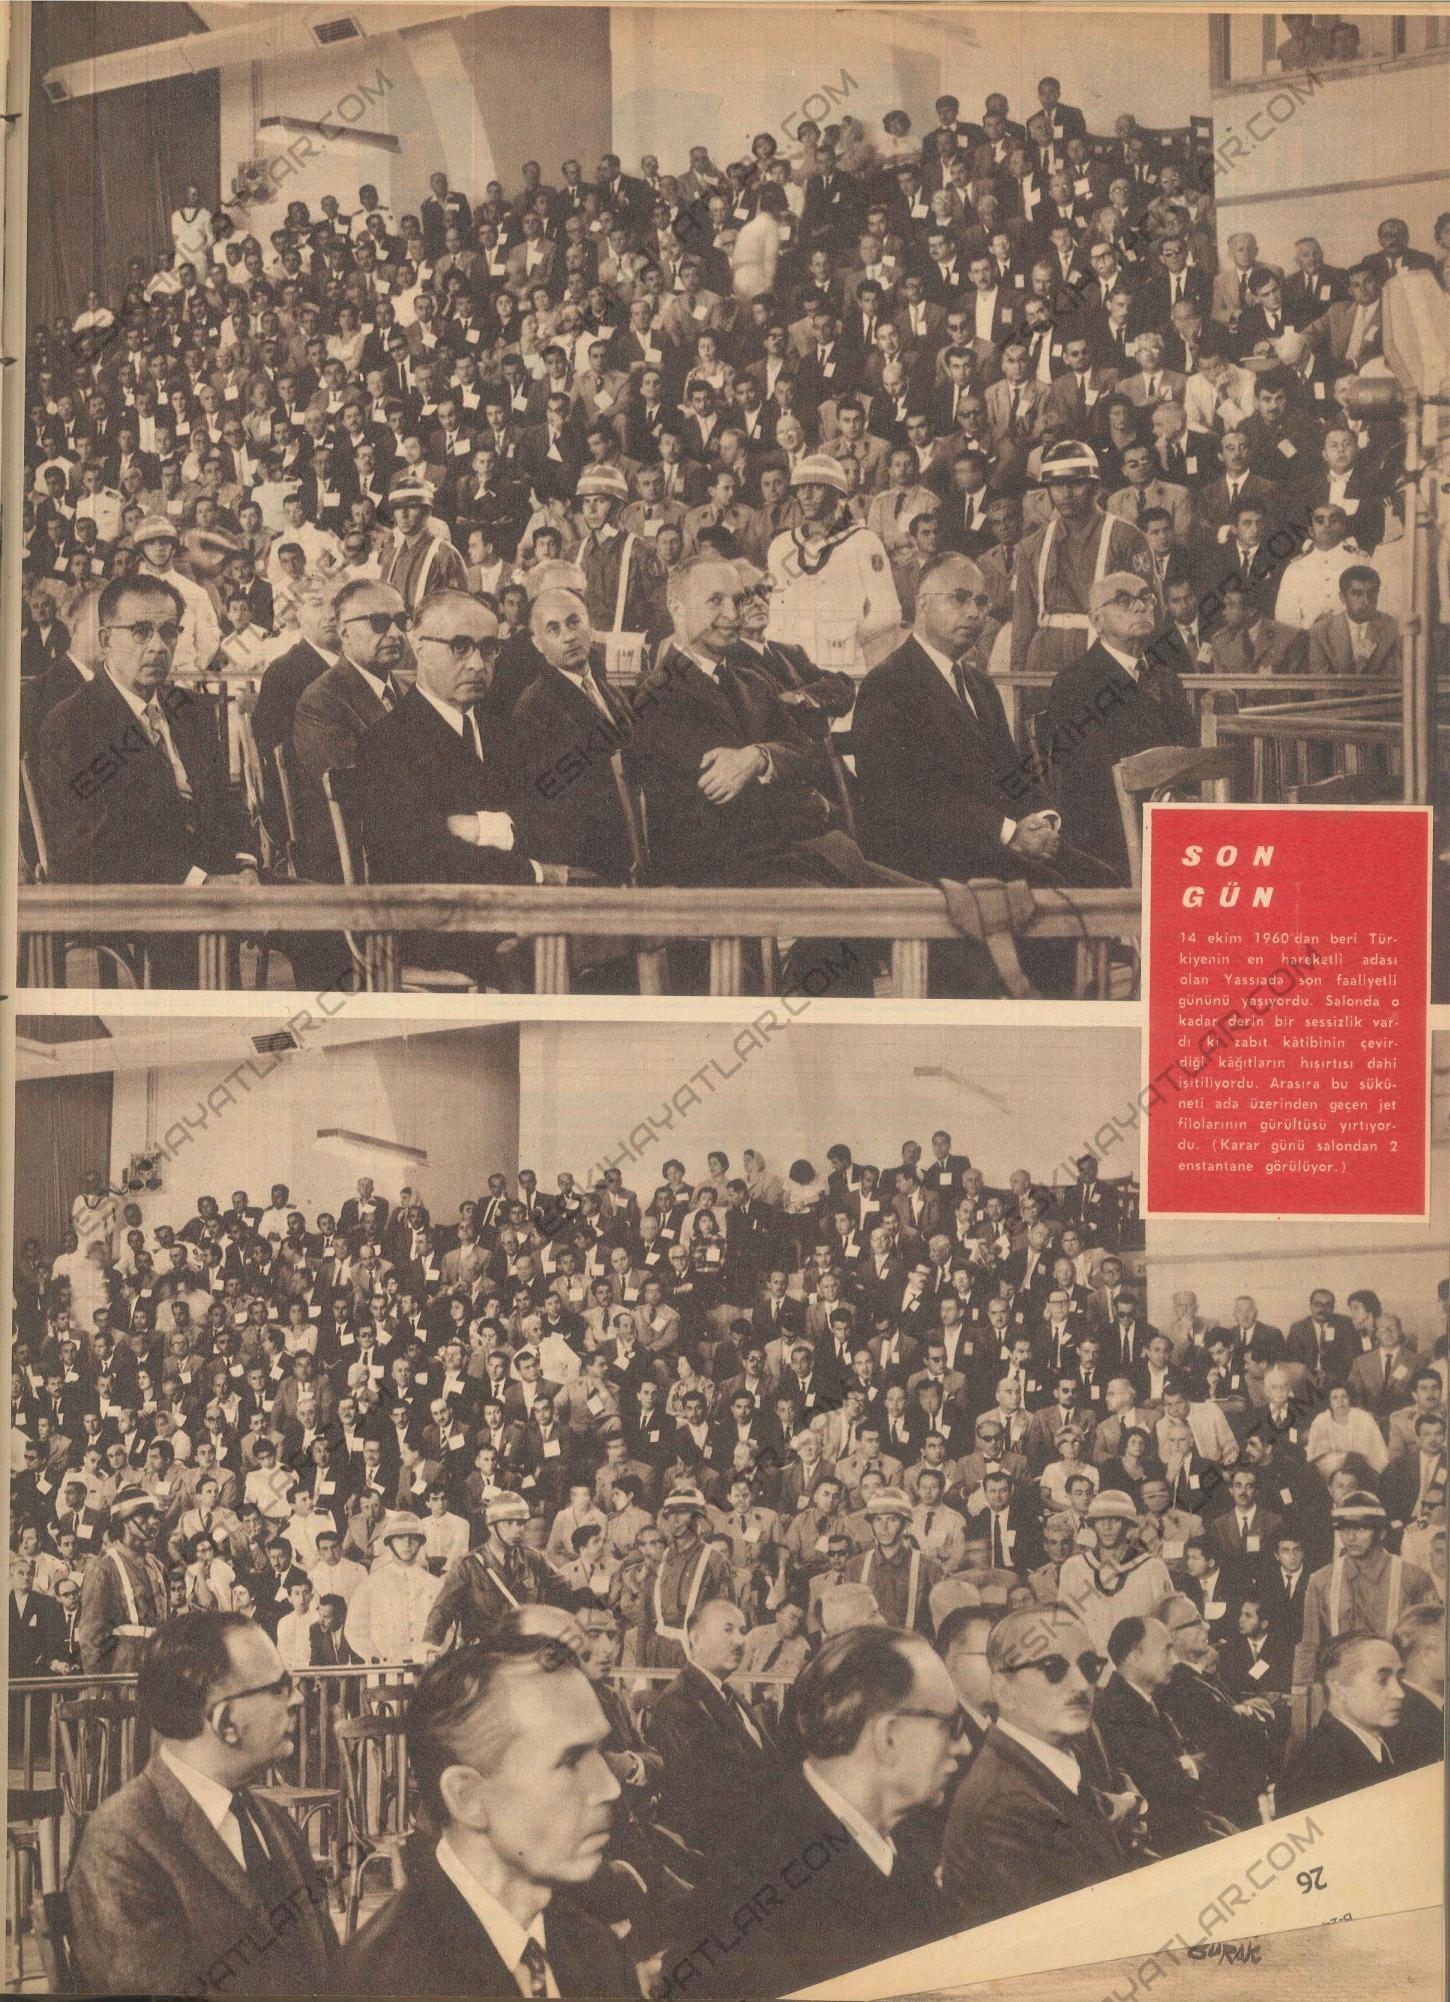 1960-ihtilali-idam-edilenler-adnan-menderes-hasan-polatkan-fatin-rustu-zorlu-yassiada-tutanaklari-1961-hayat-dergisi-arsivleri (25)